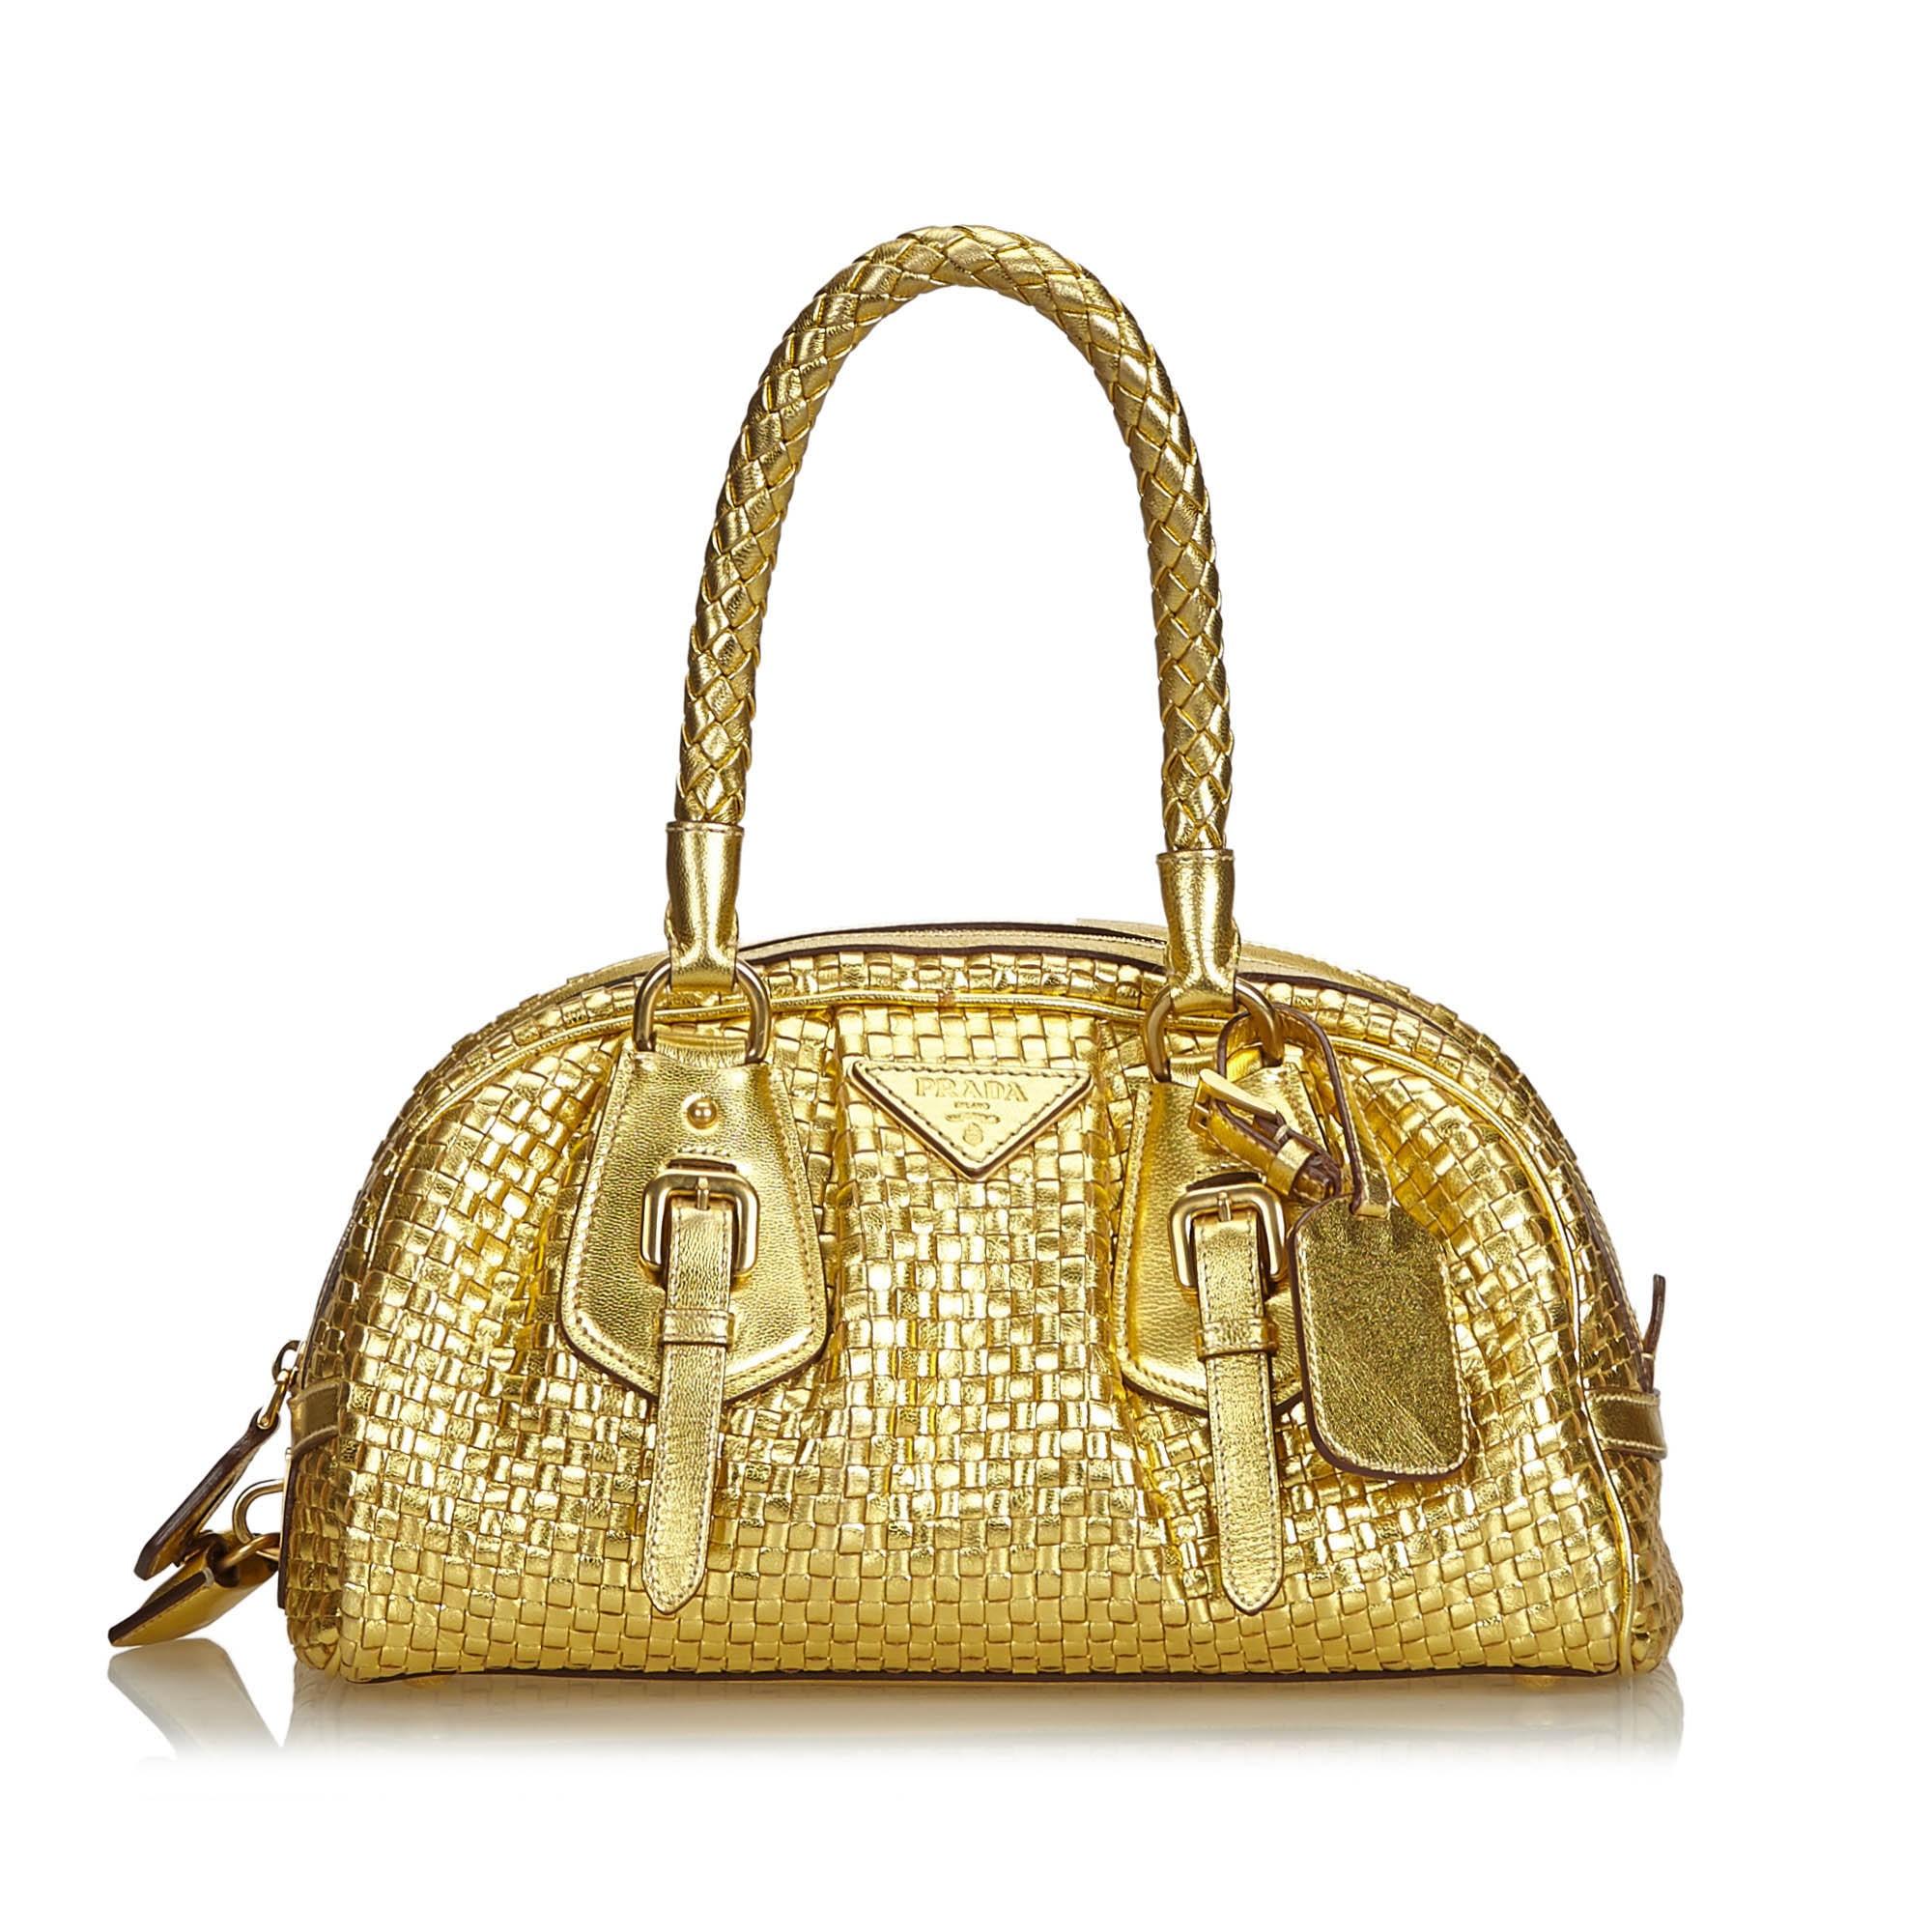 349575d847c1 Prada Vintage - Madras Intreccio Frame Metallic Handbag Bag - Gold -  Leather Handbag - Luxury High Quality - Avvenice